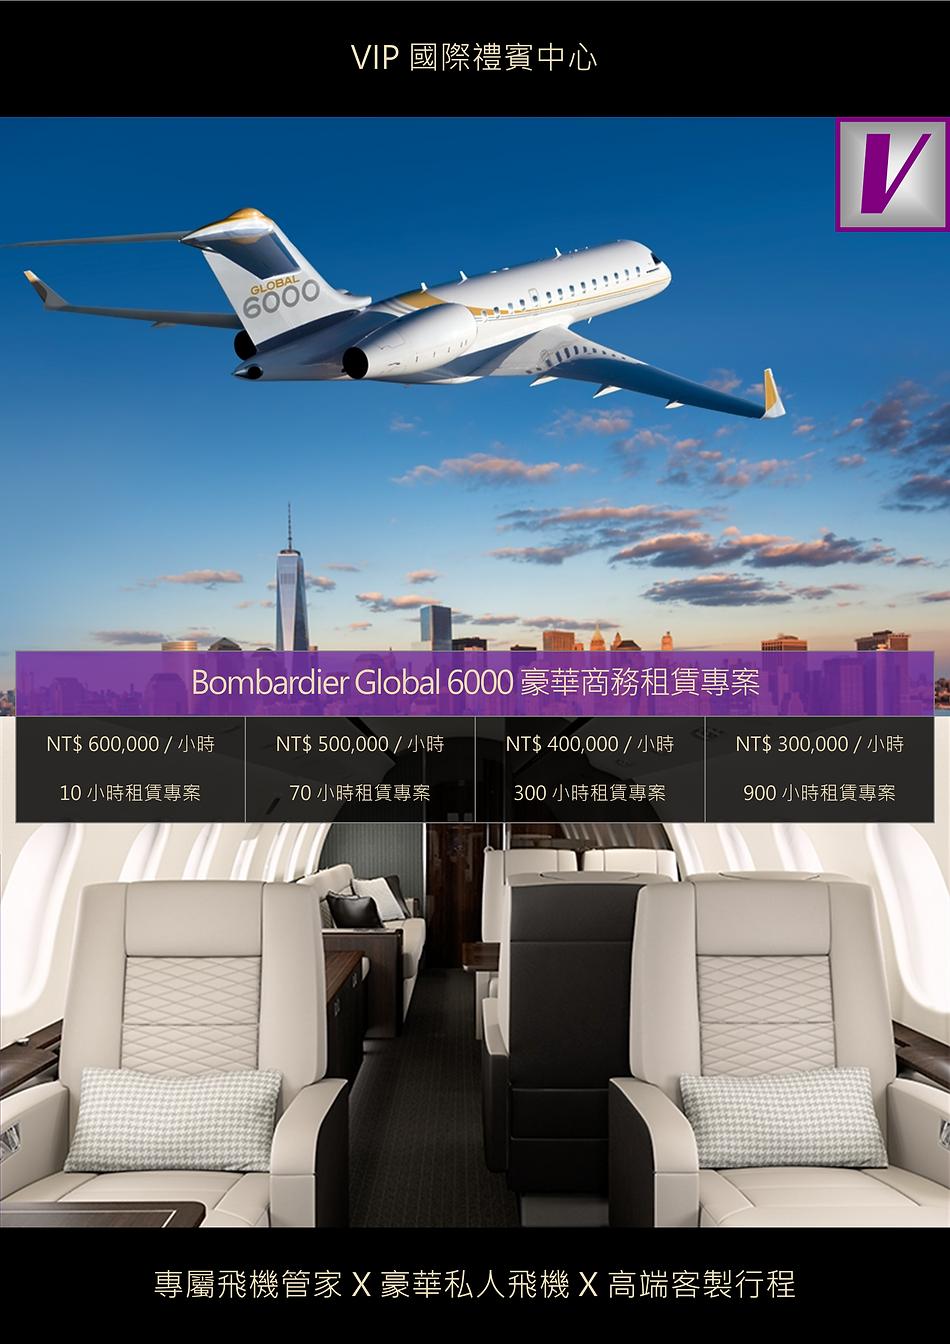 VIP國際禮賓中心 BOMBARDIER GLOBAL 6000 豪華商務租賃專案 DM.png